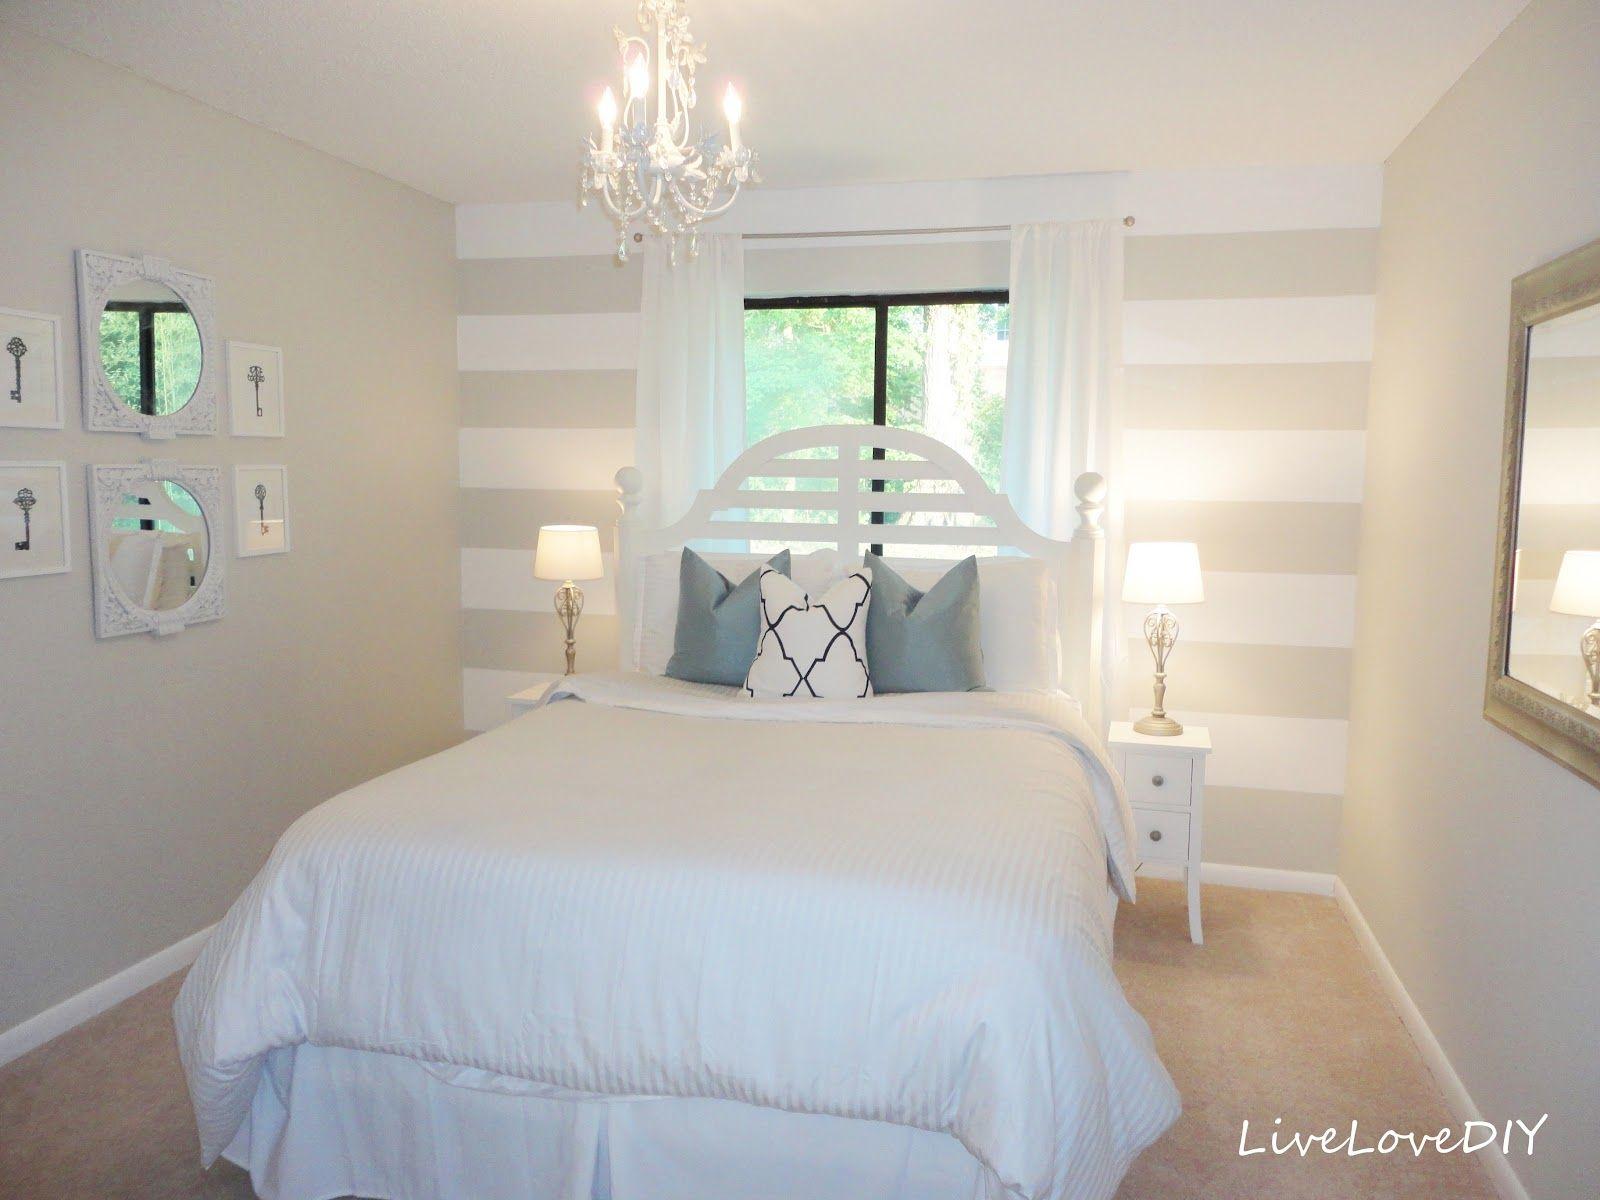 DIY Striped Wall Guest Bedroom Makeover Guest bedroom